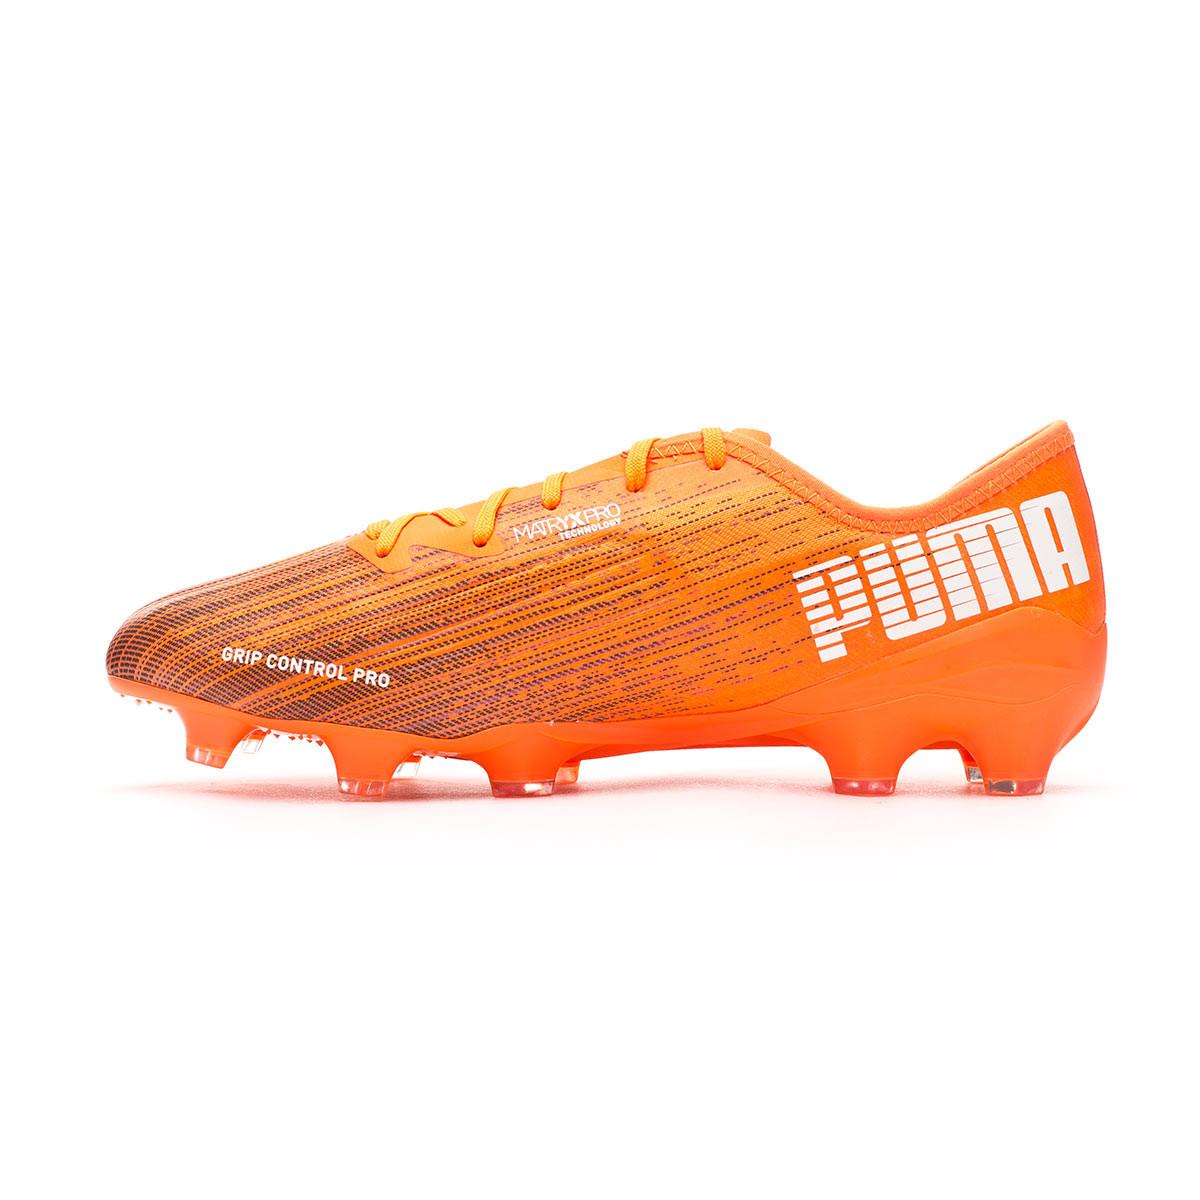 Football Boots Puma Ultra 2.1 FG/AG